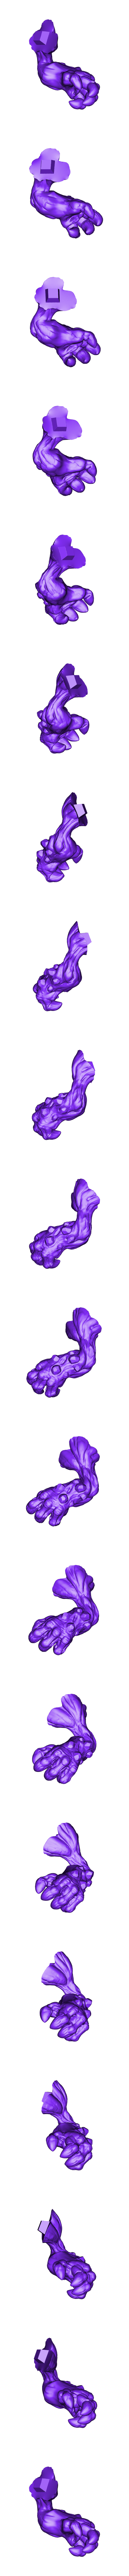 Mushroom_arm_left.stl Download free STL file Mushroom man • 3D printer design, duncanshadow